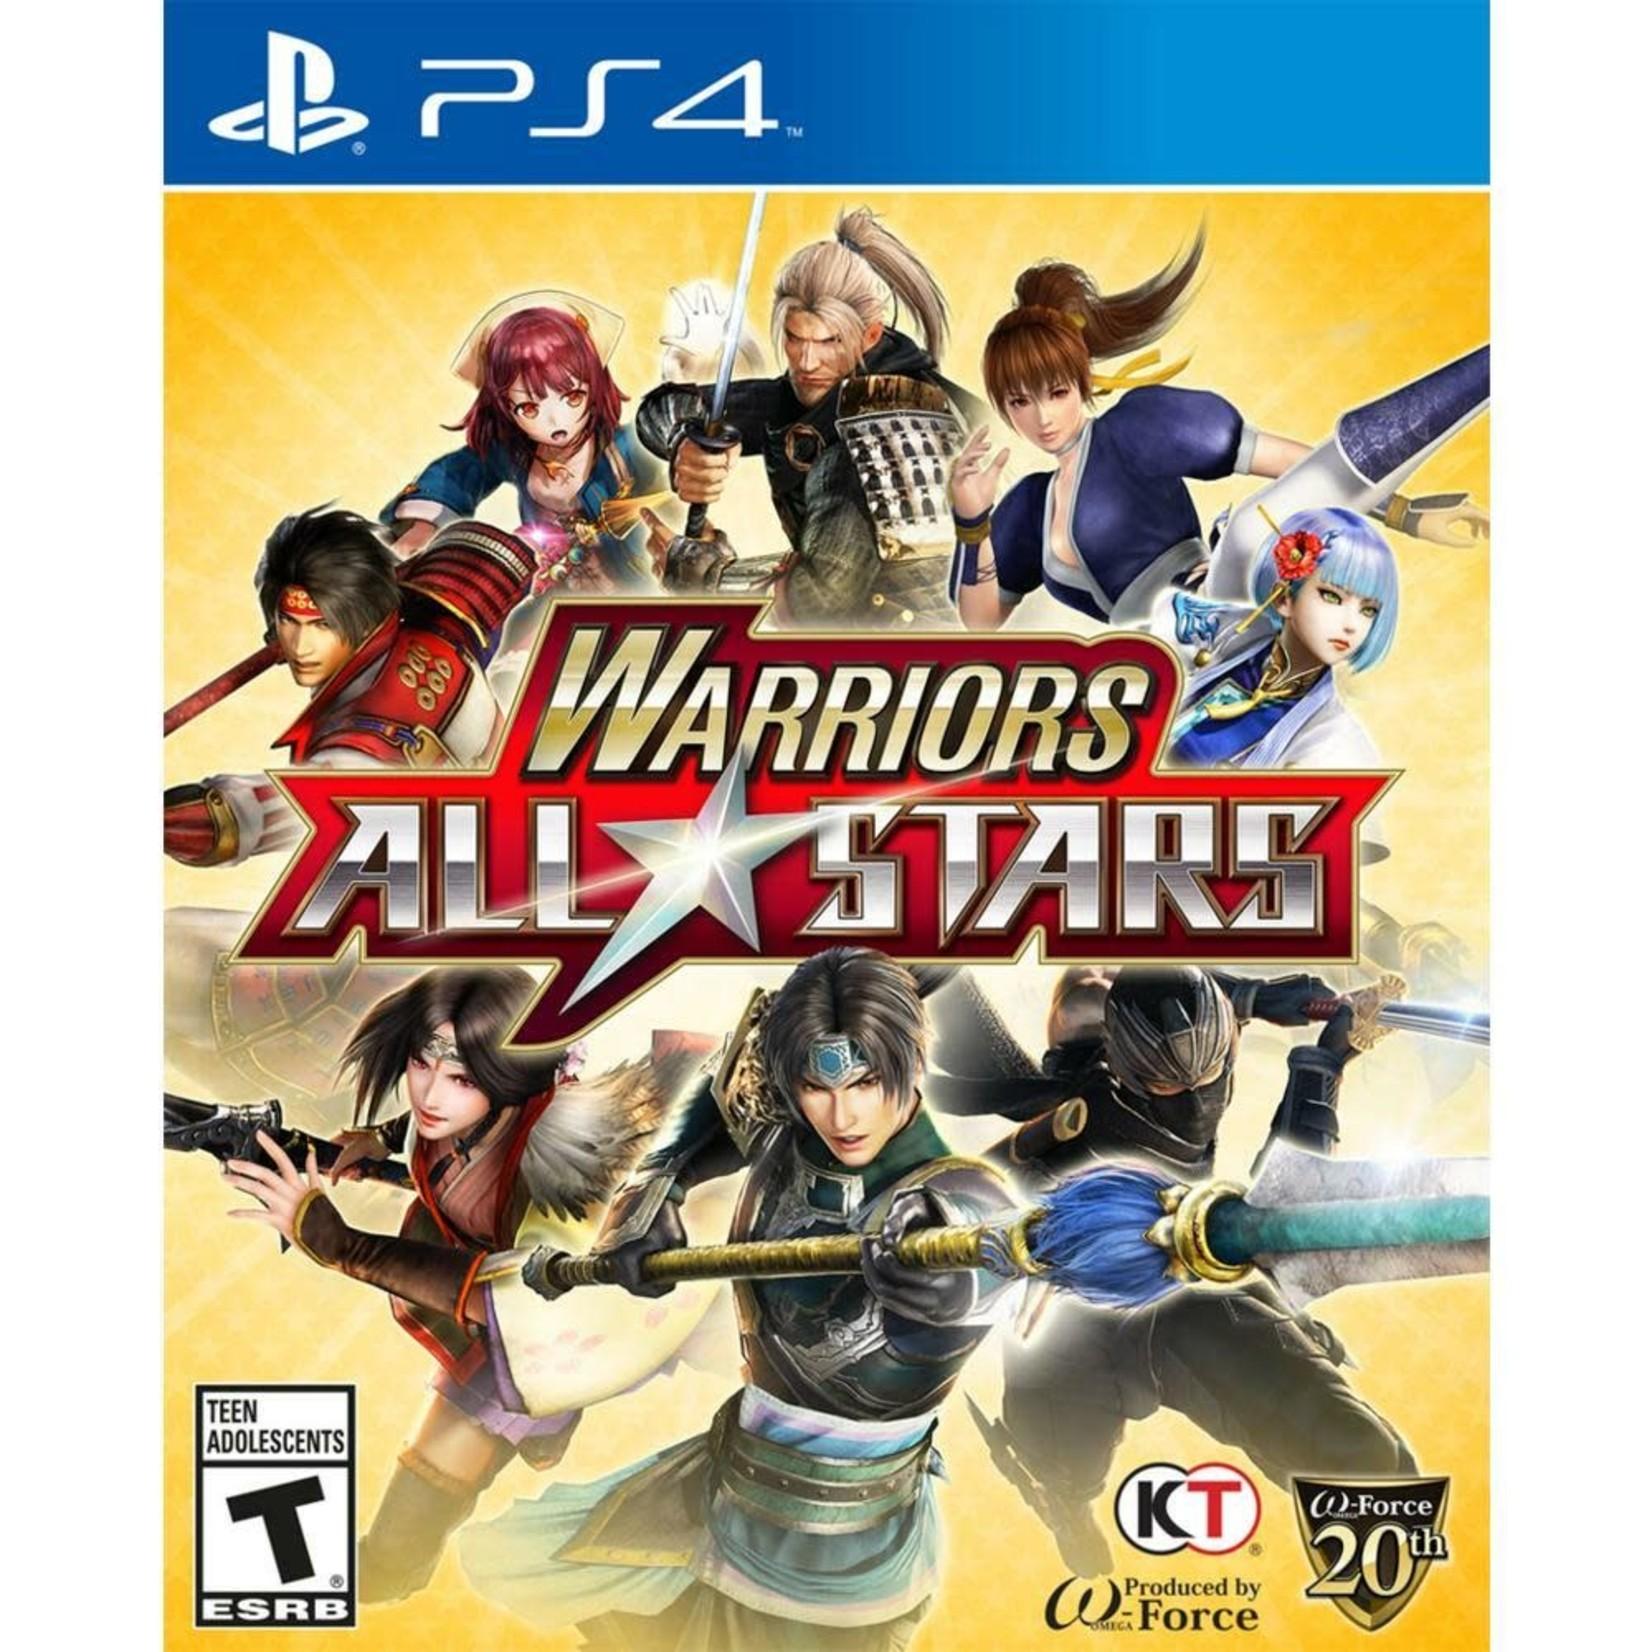 PS4-Warriors All-Stars